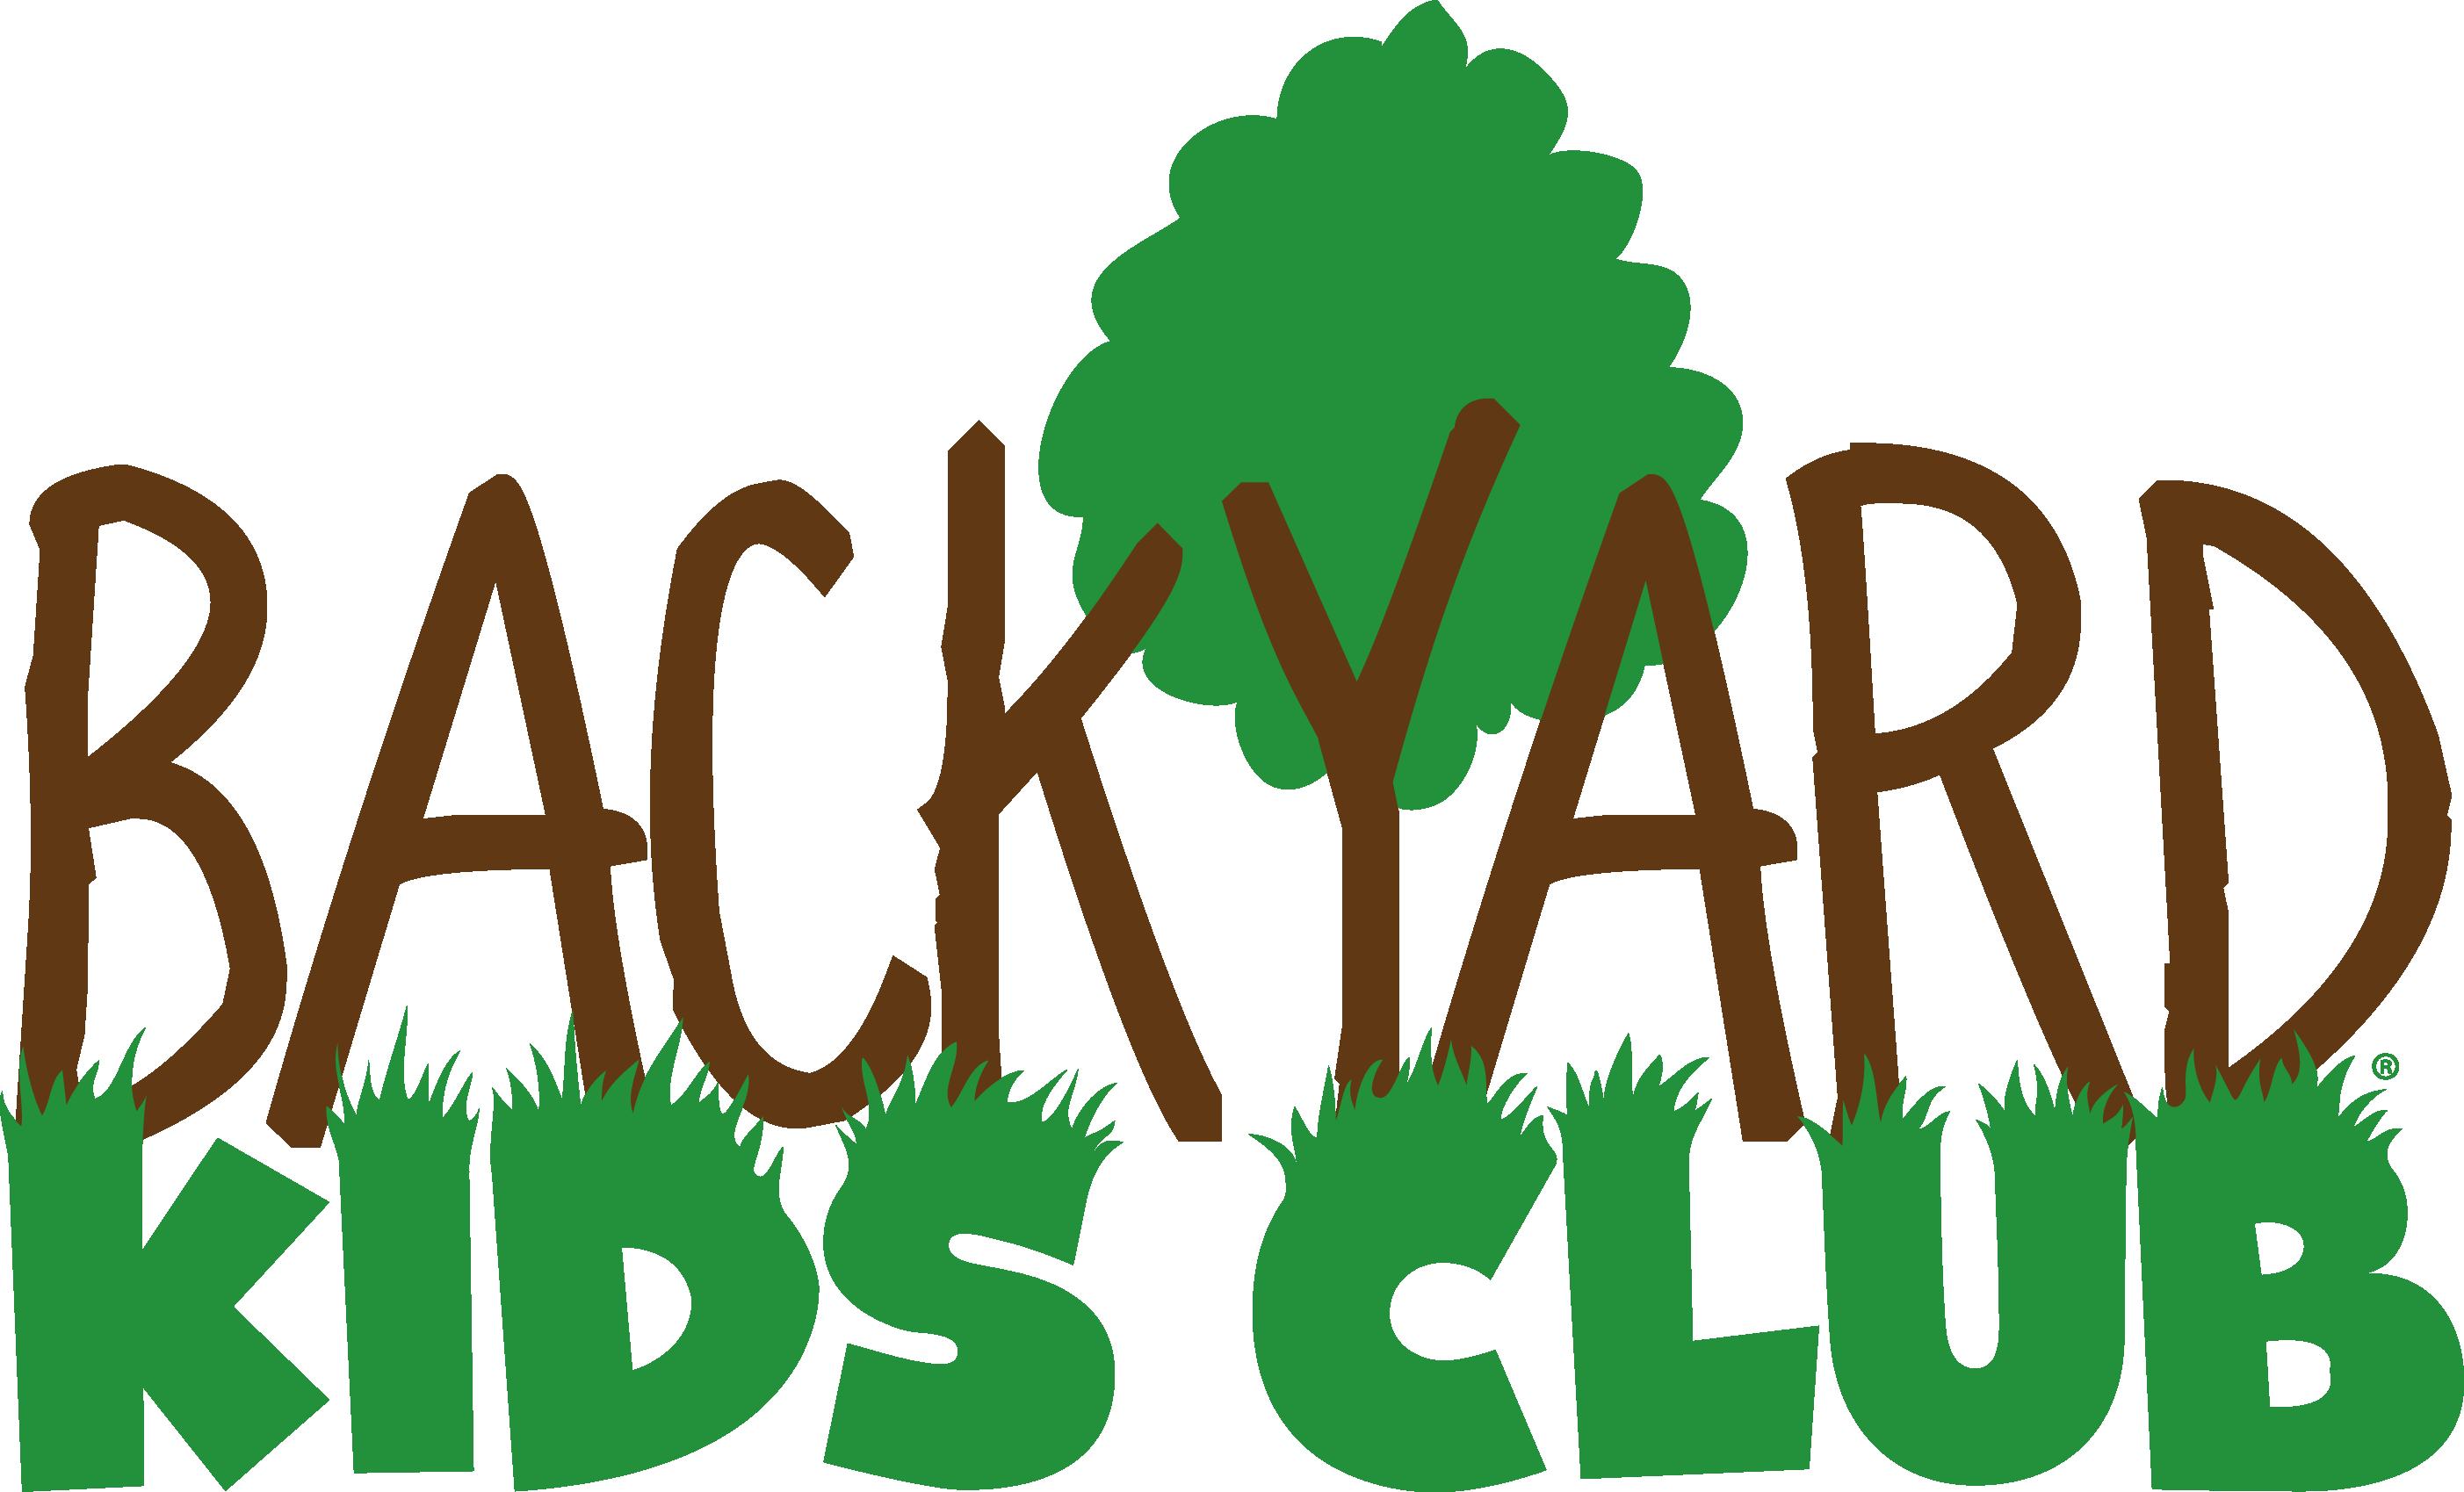 backyard clip art free clipart panda free clipart images rh clipartpanda com  youth ministry clipart